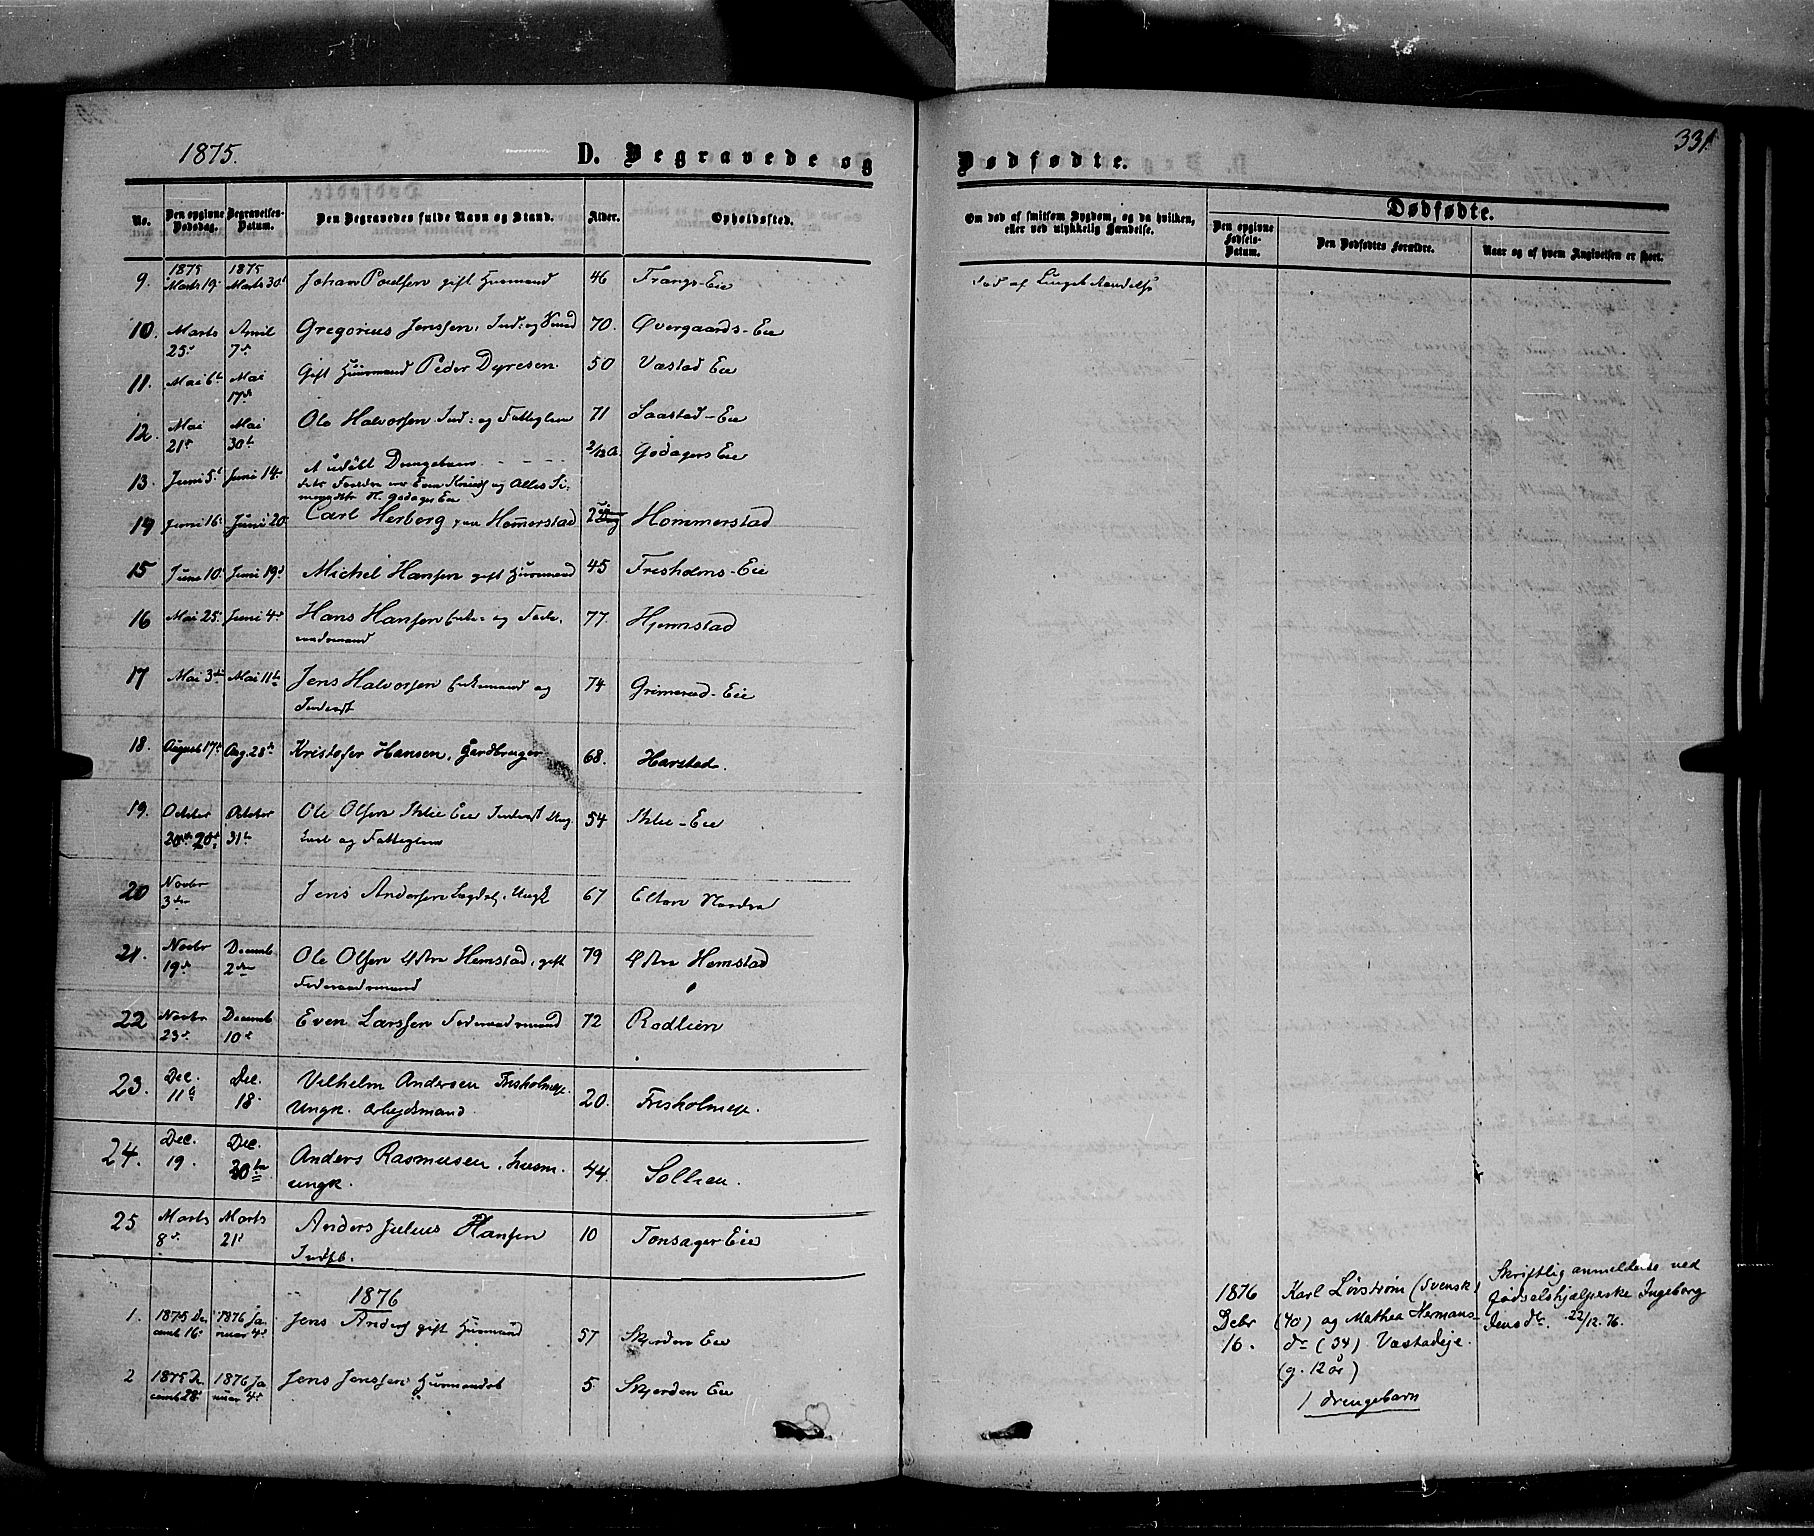 SAH, Stange prestekontor, K/L0013: Ministerialbok nr. 13, 1862-1879, s. 331